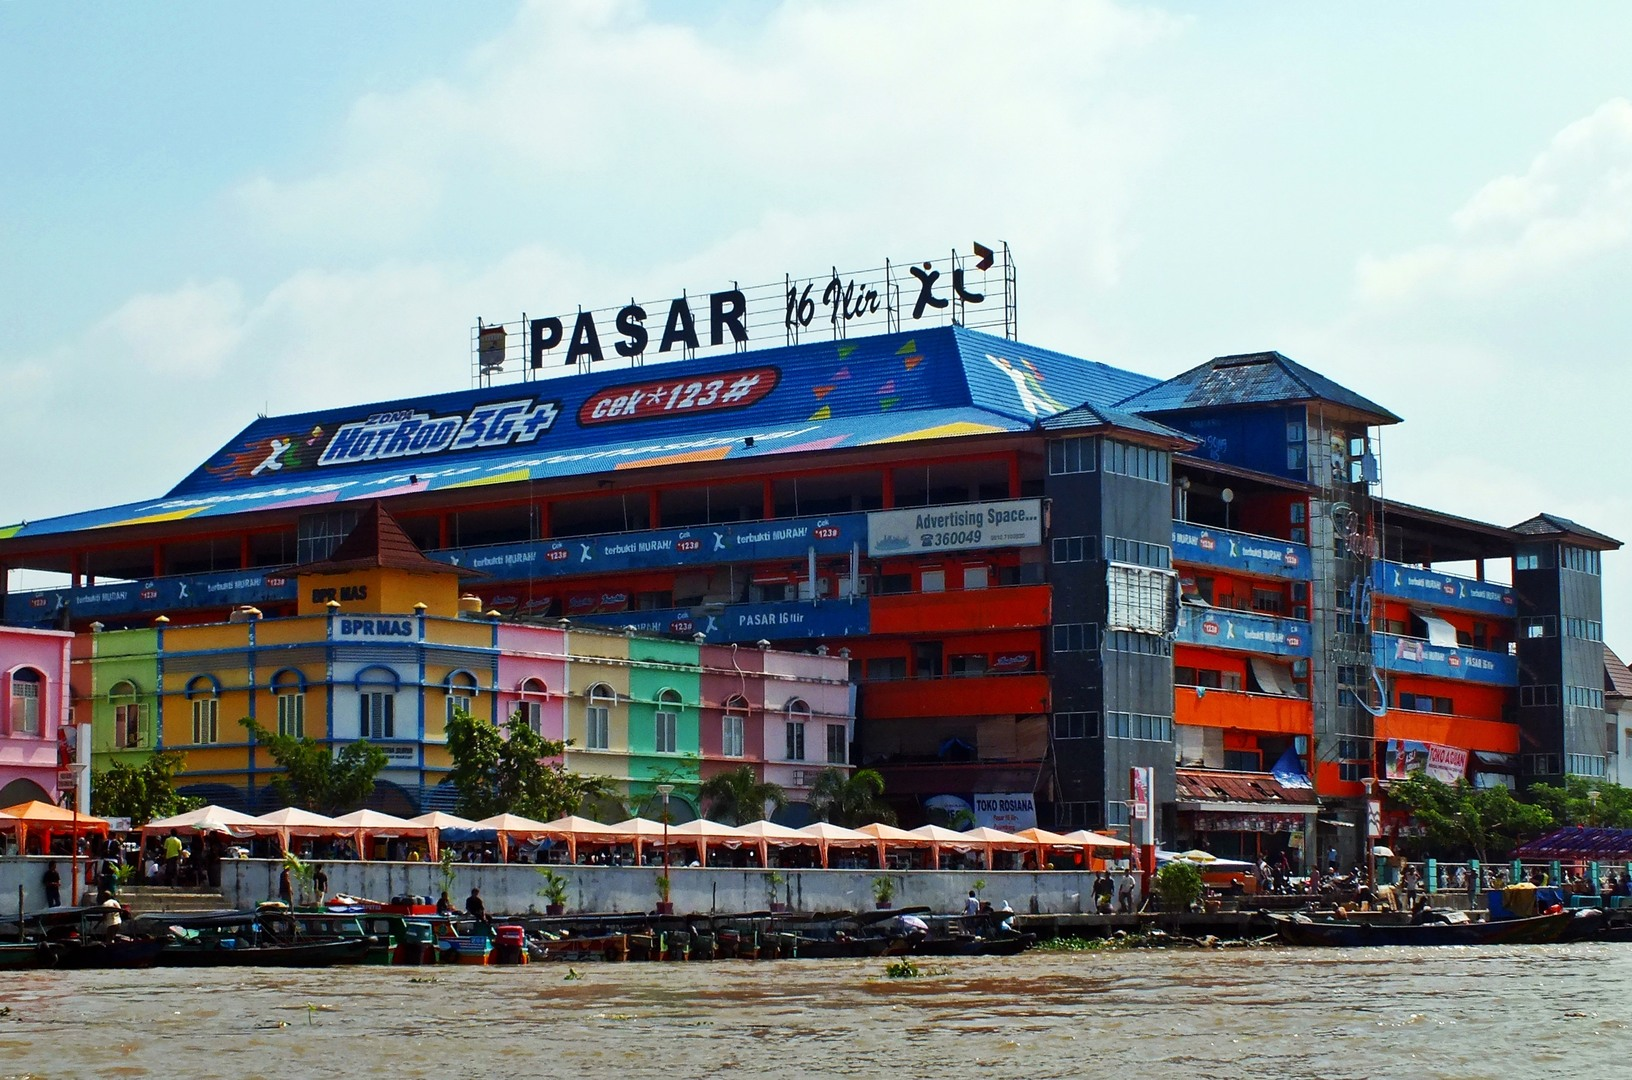 1.-Pasar-16-Ilir-Tempat-Wisata-Belanja-Wajib-di-Palembang1